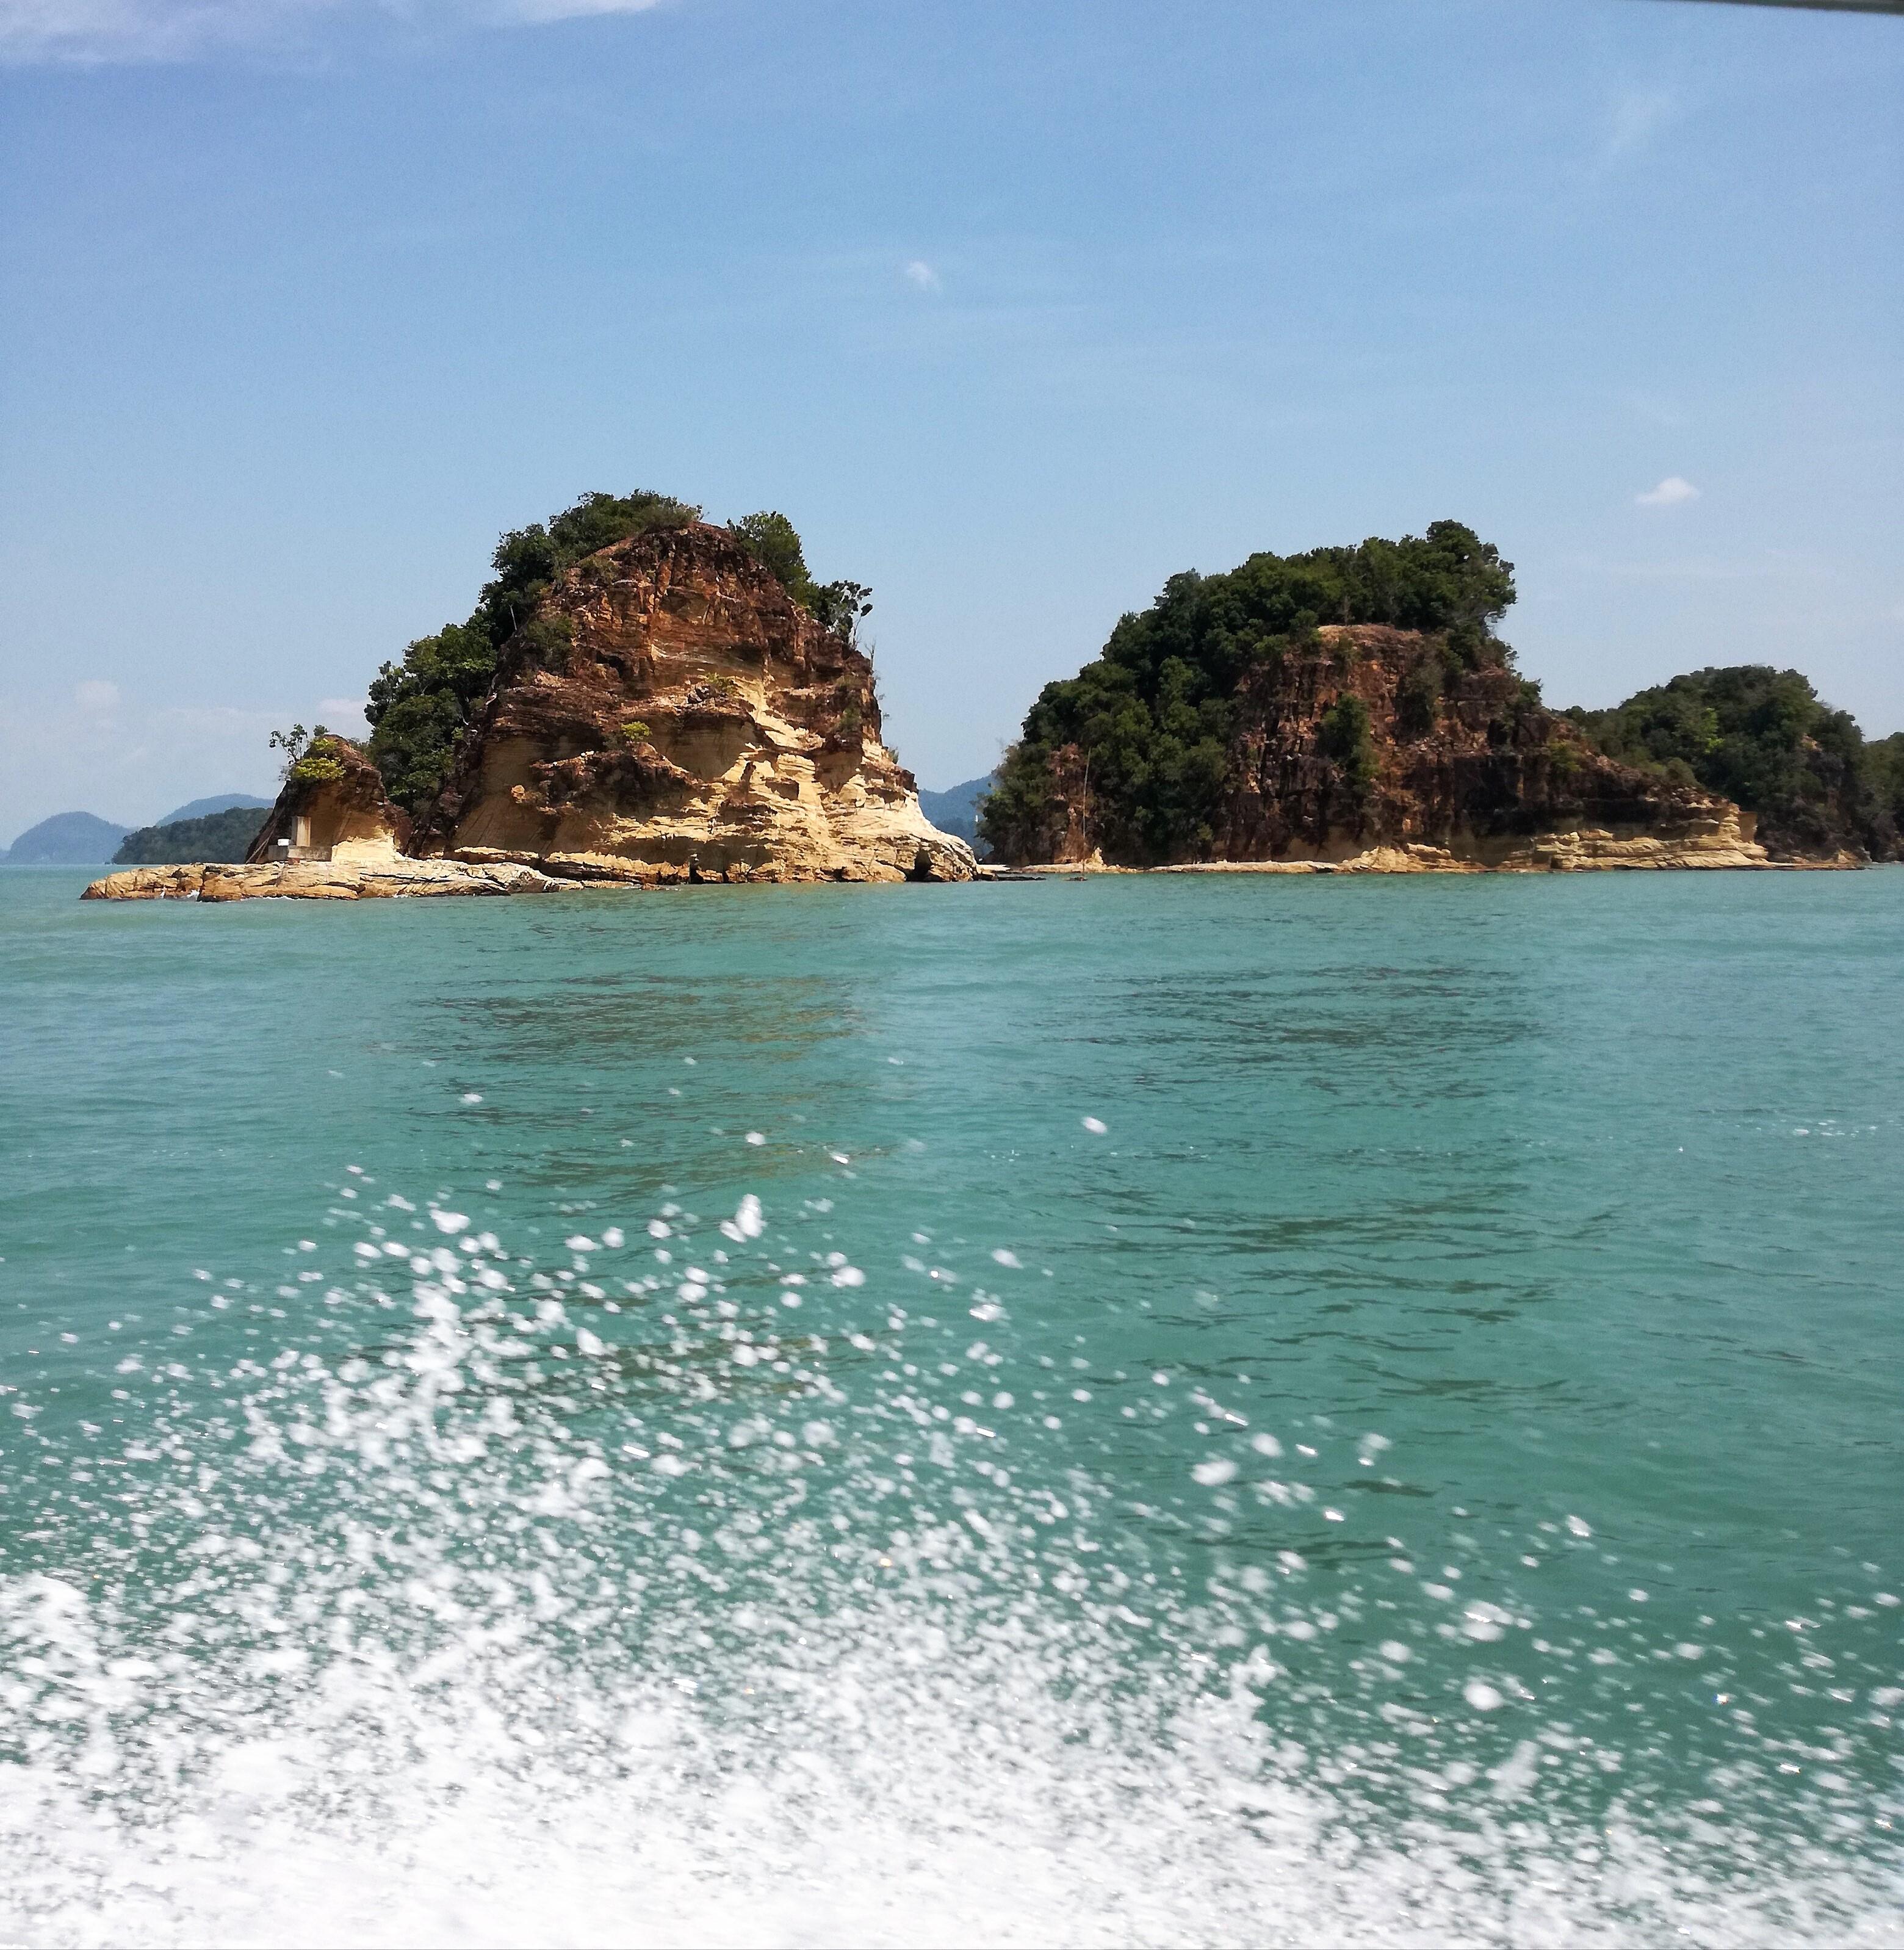 Malaysia Beaches: Langkawi Island - Amazing Place